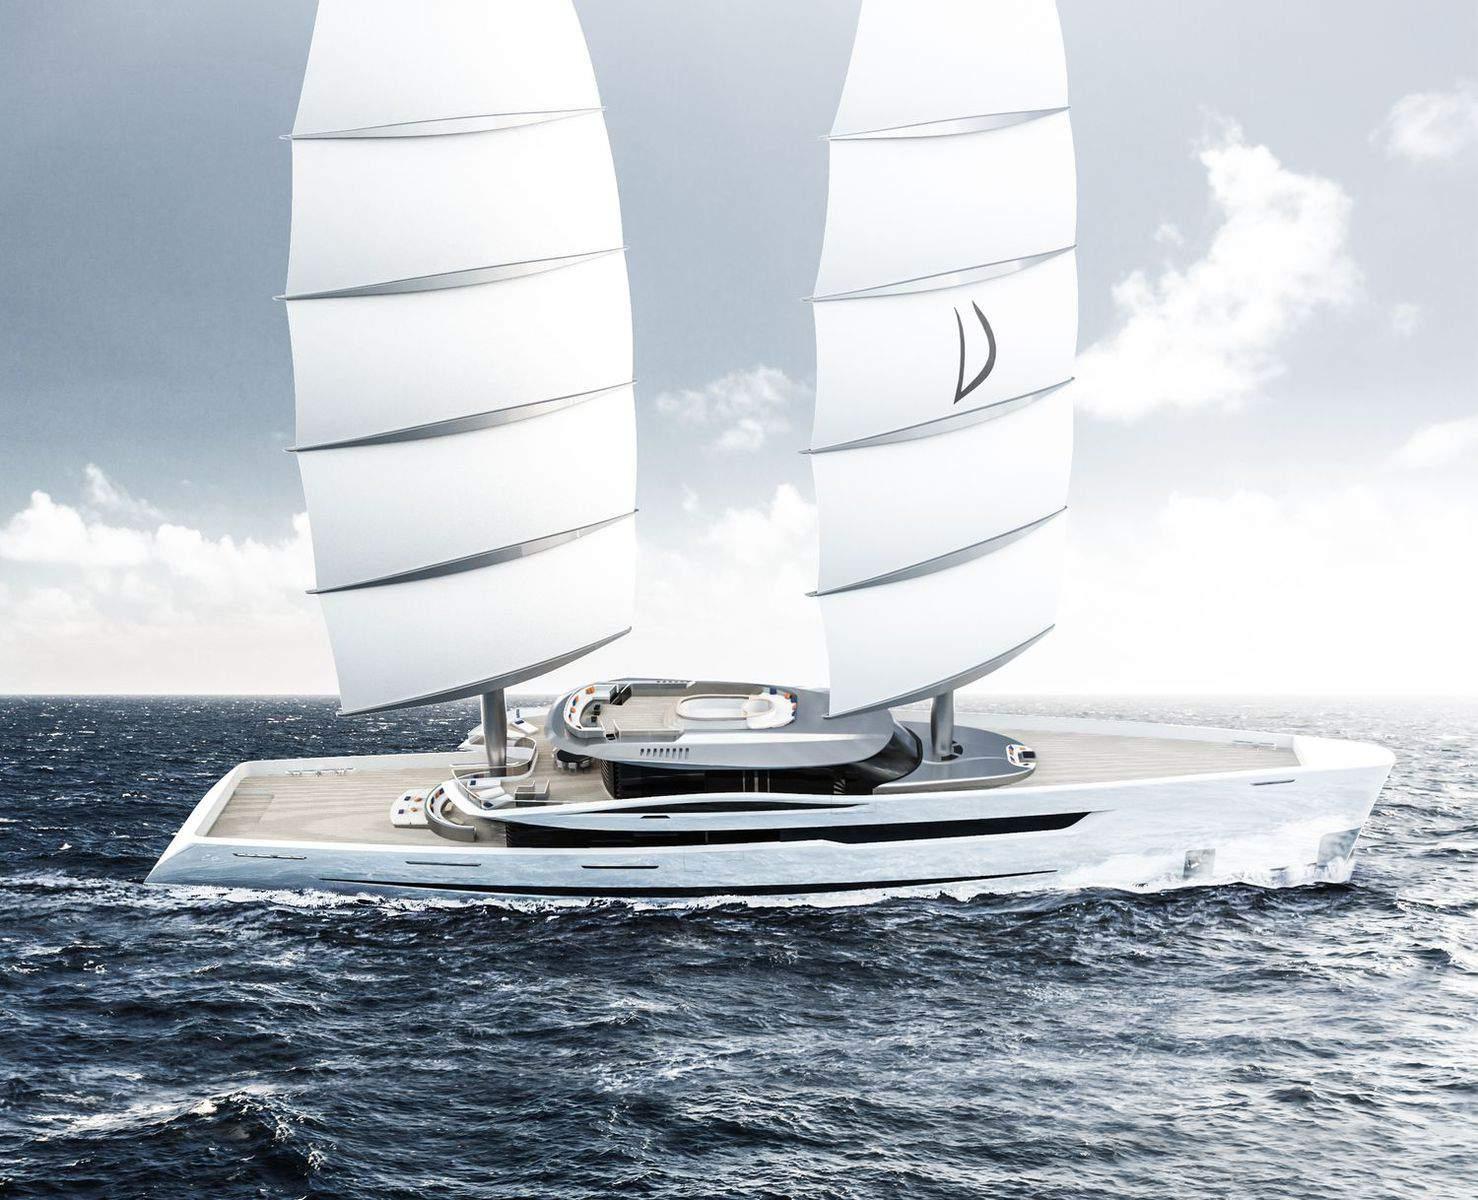 VELA-Sailing-Yacht-Gianmarco-Cardia-Dyna-Rig-1